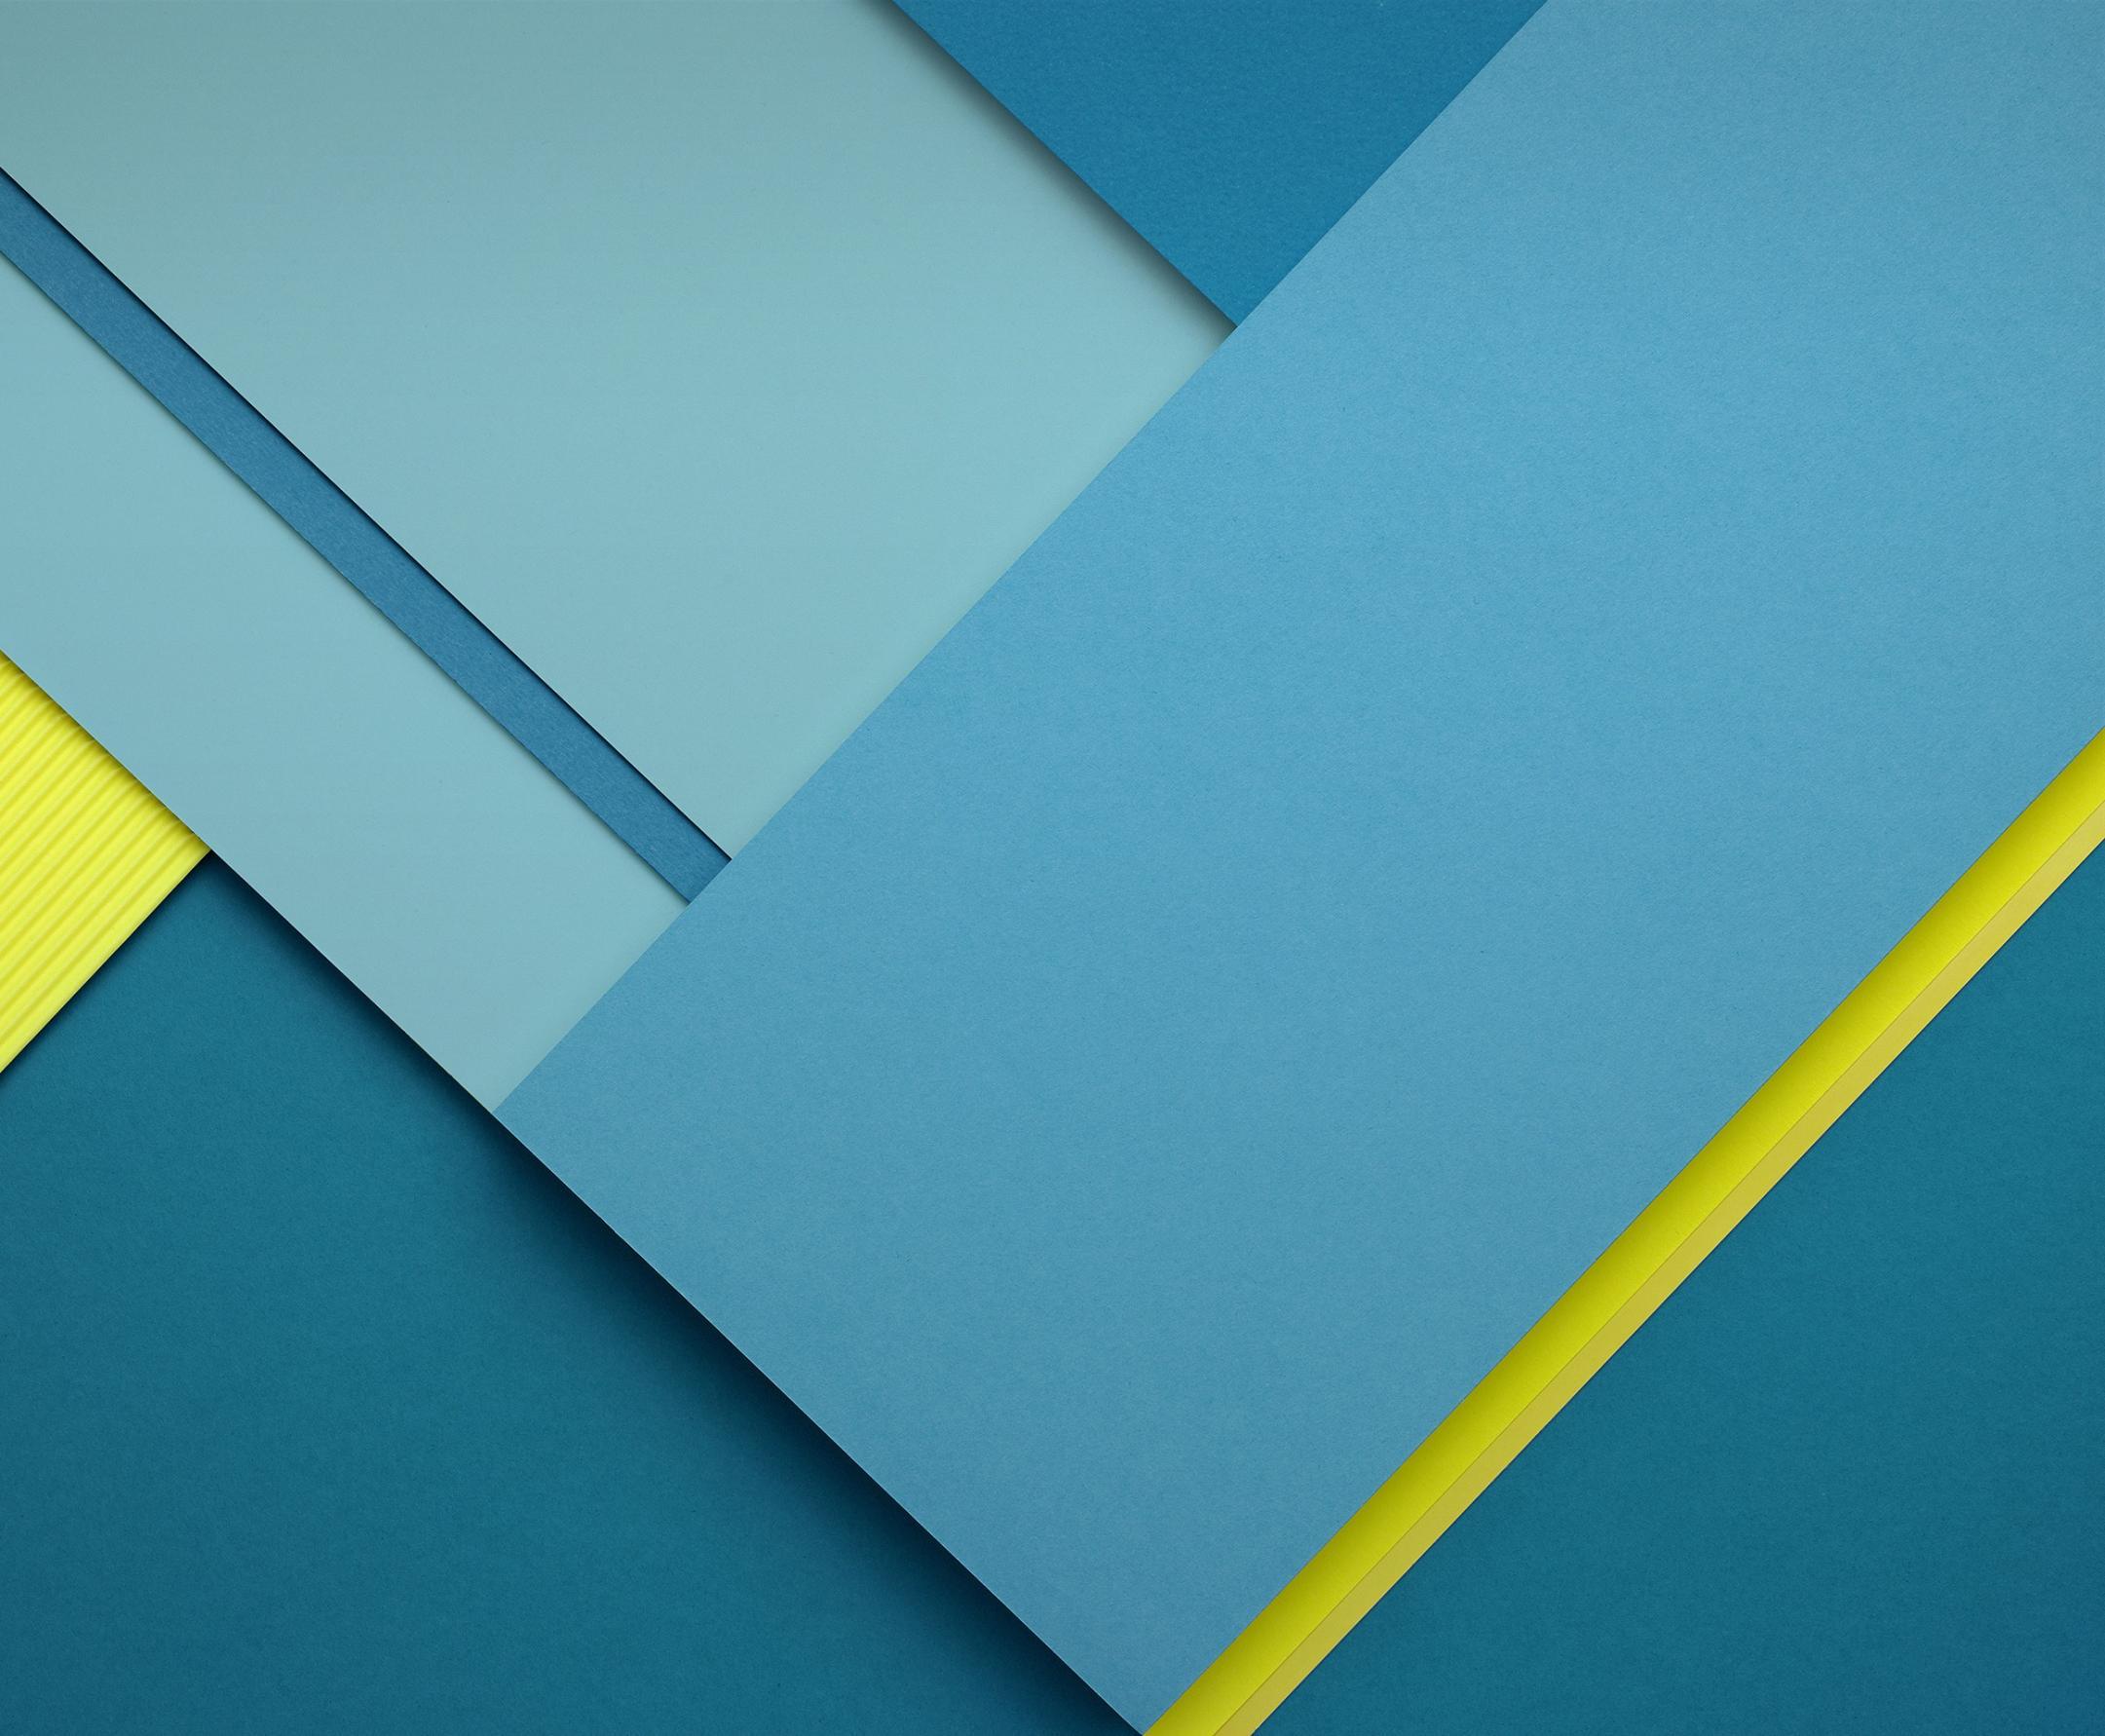 45+] Galaxy S6 Default Wallpaper on WallpaperSafari